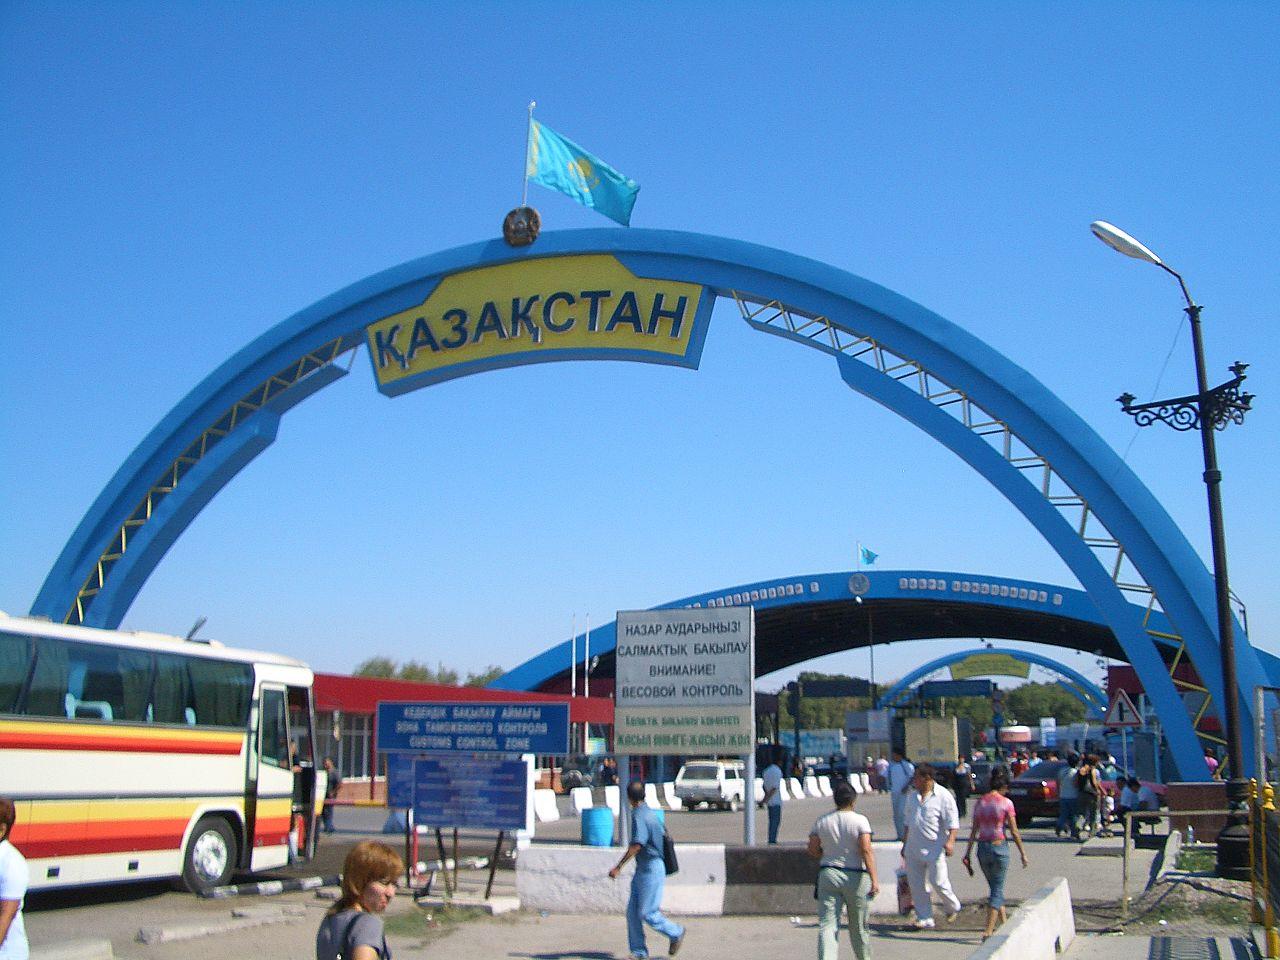 Для въезда в Казахстан нужно пройти ПЦР-тестирование на коронавирус